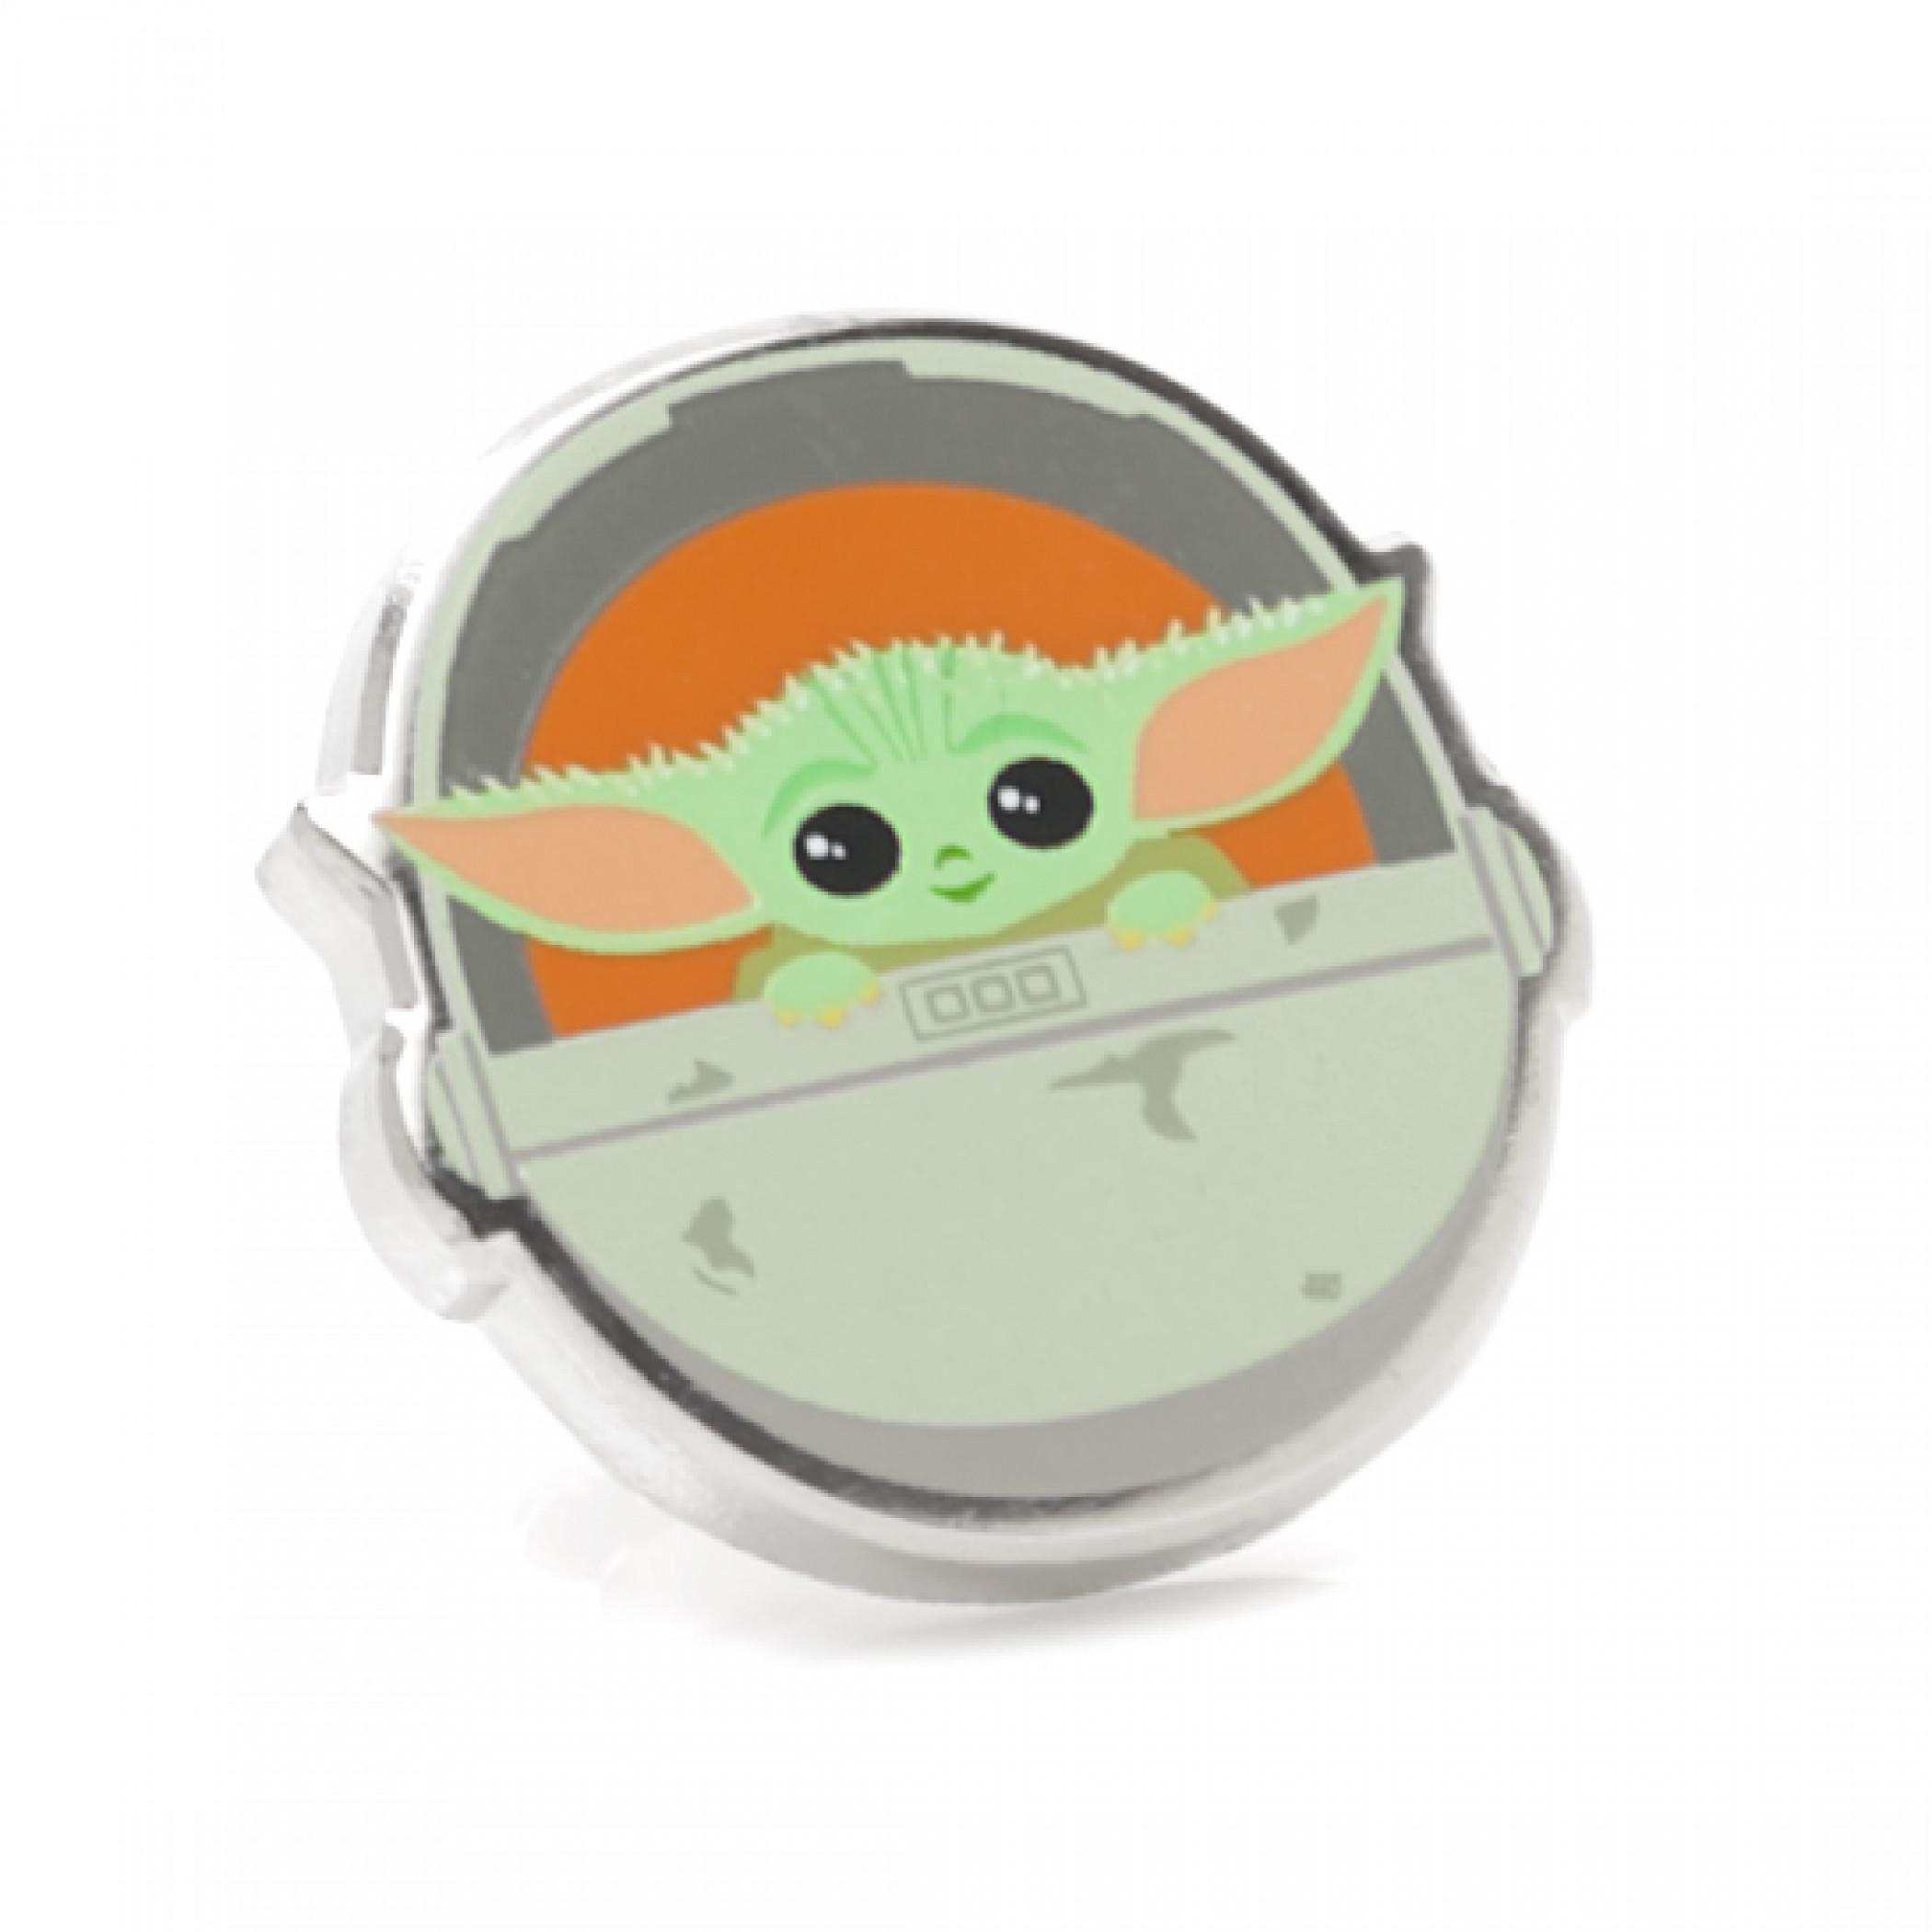 Star Wars The Mandalorian's The Child Lapel Pin